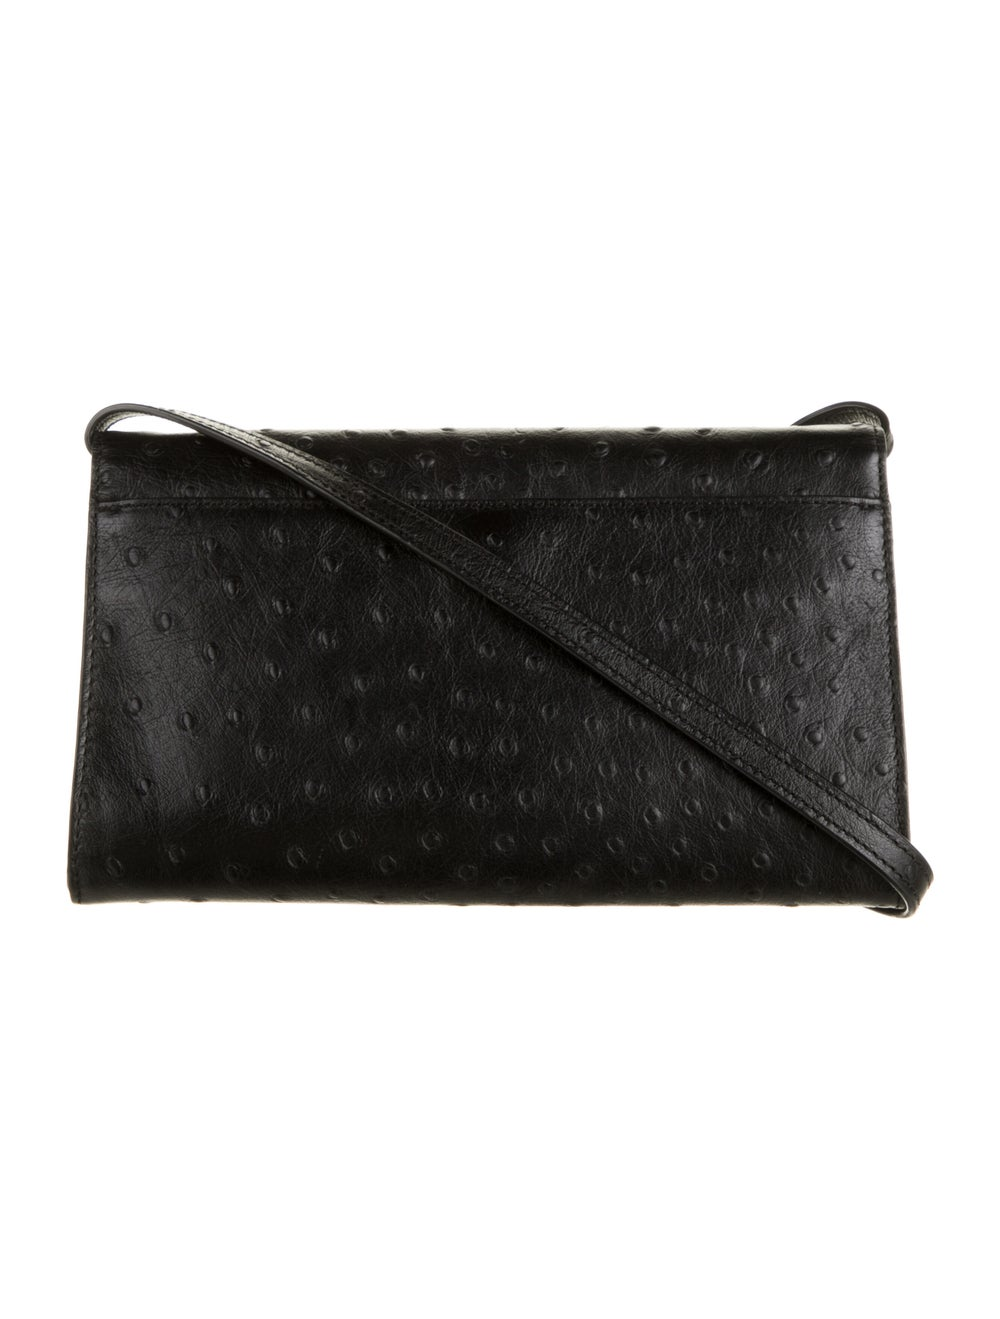 Michael Kors Embossed Leather Bag Black - image 4